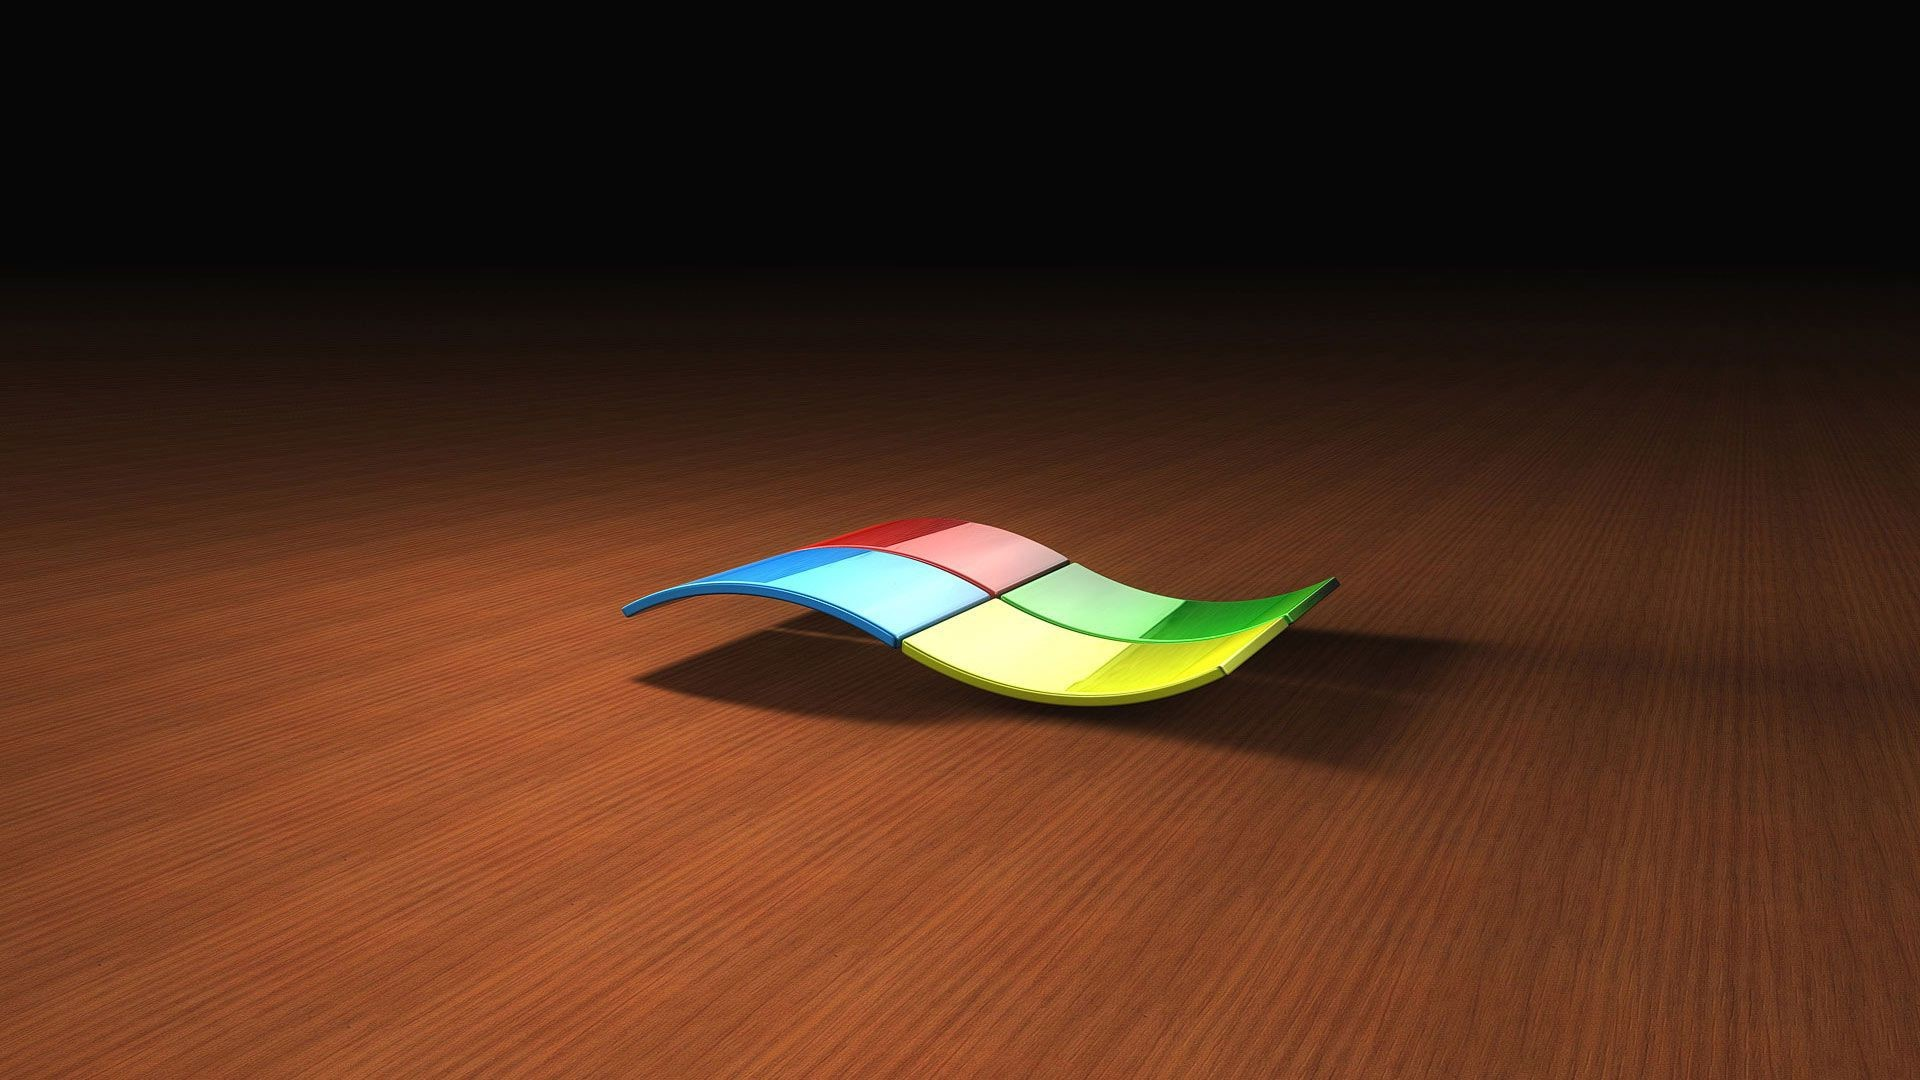 Data-src /w/full/9/2/b/77453 - Windows Desktop Background Hd - HD Wallpaper